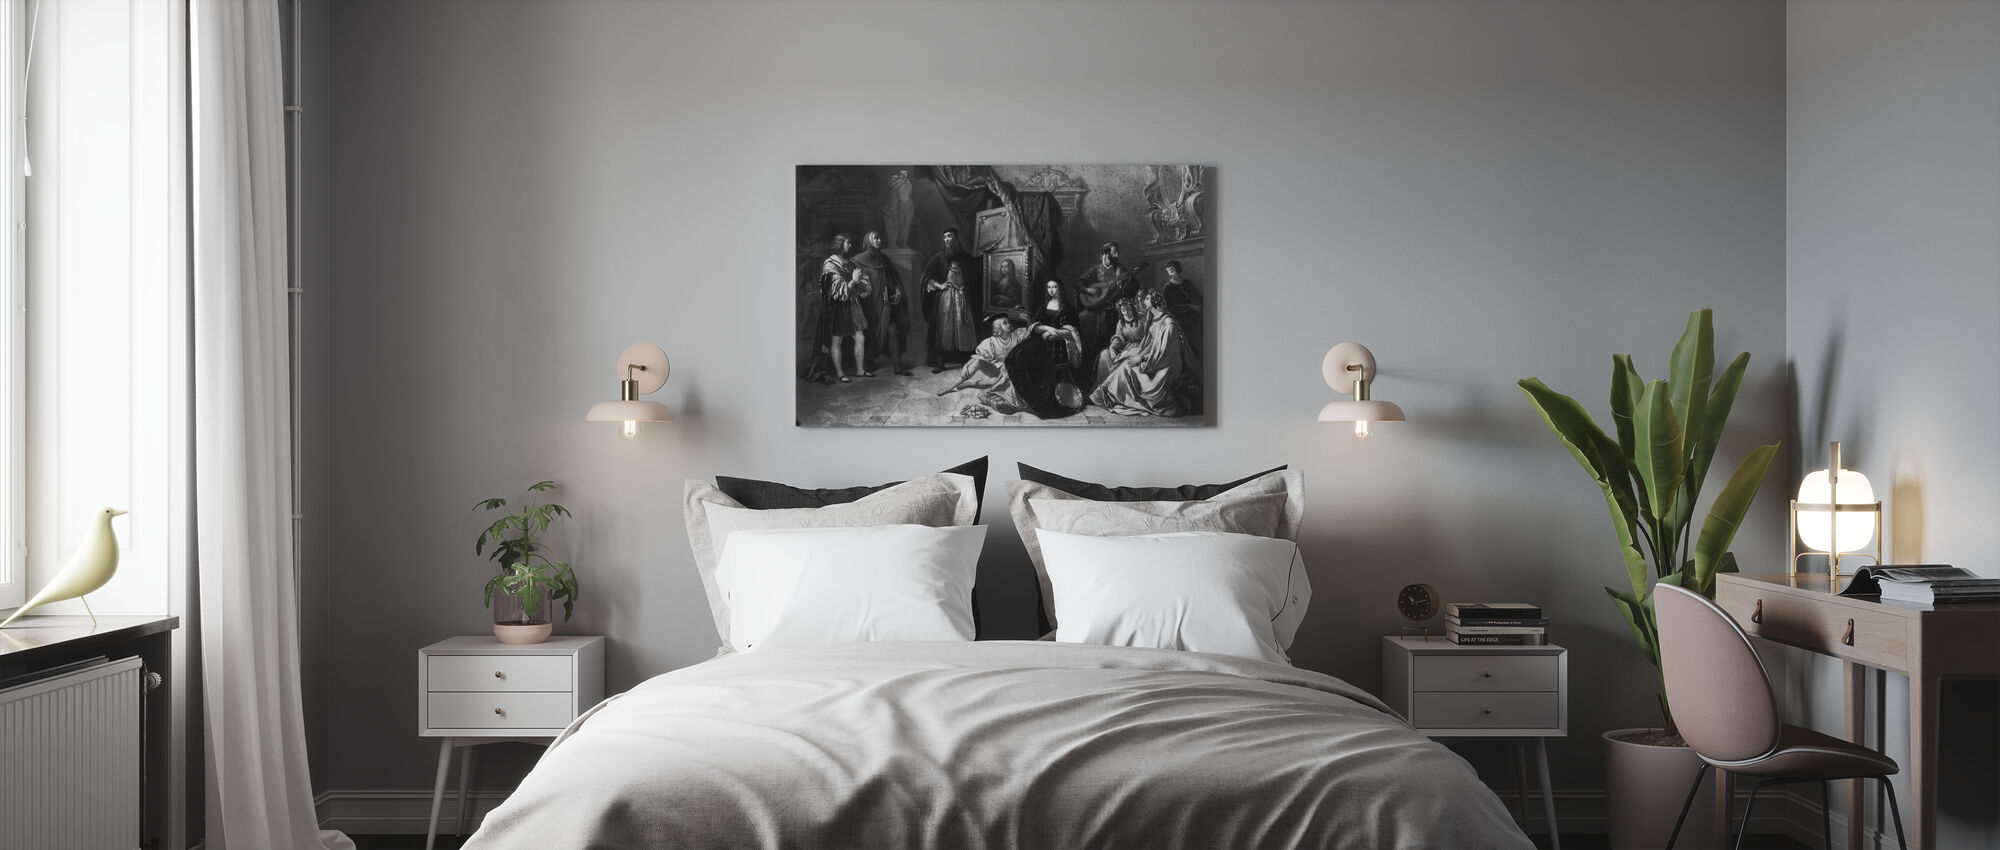 Gioconda - Aimee Brune - Canvas print - Bedroom